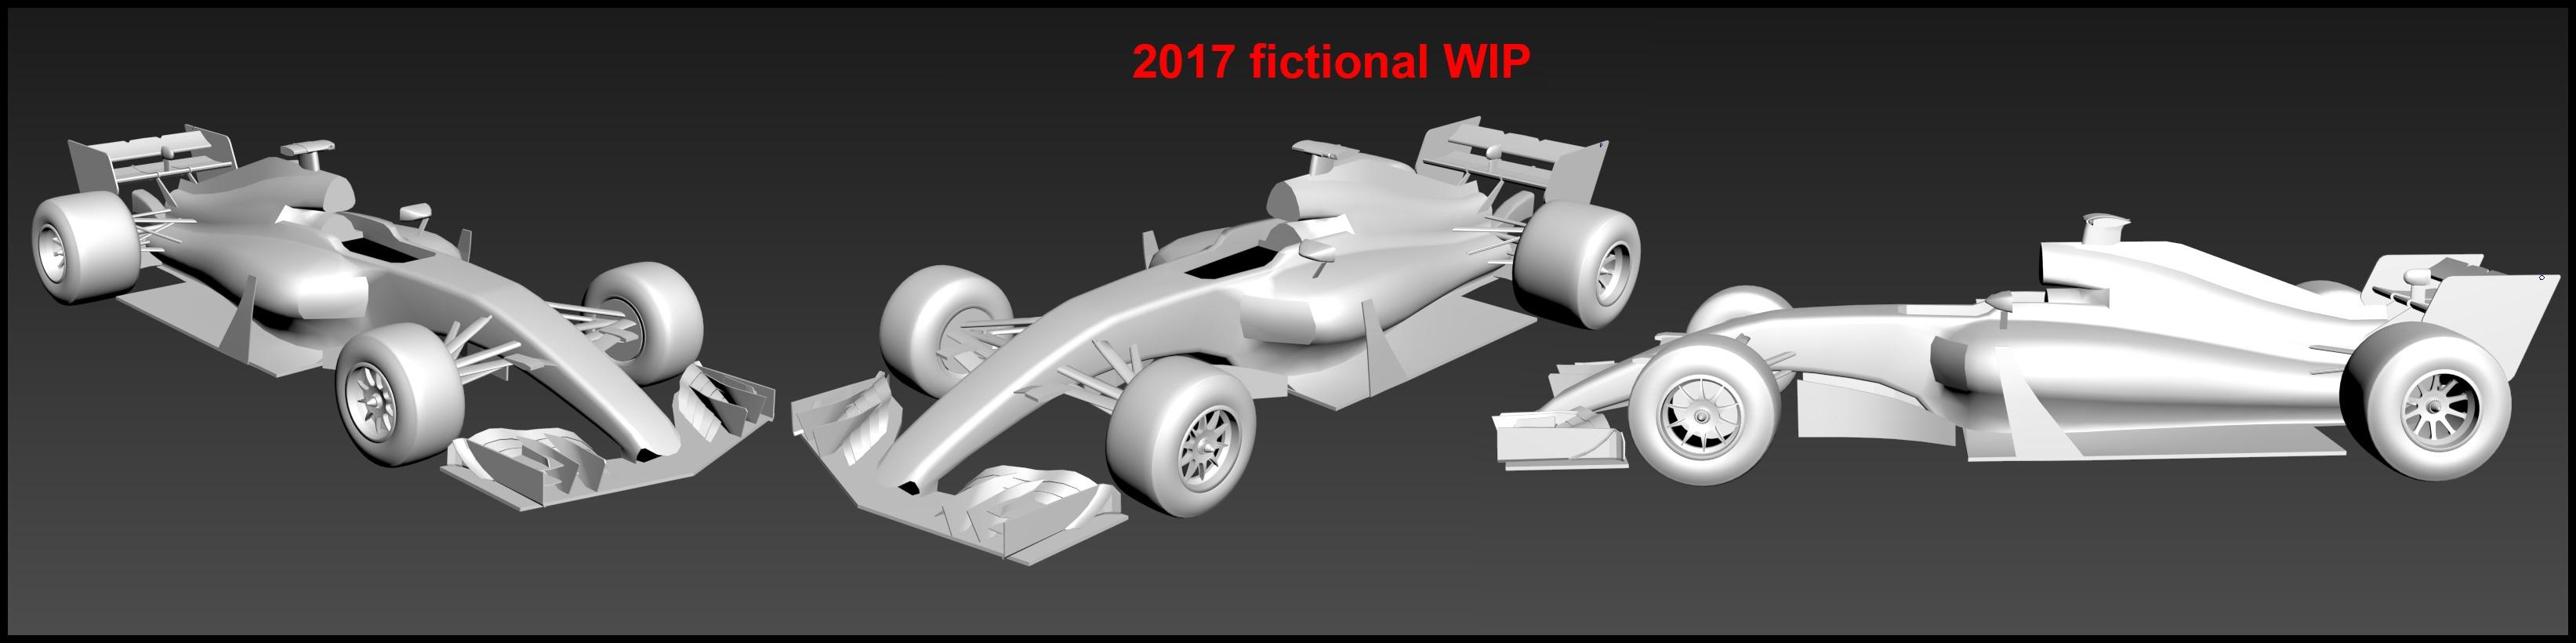 AMS 2017 Fictional WIP.jpg